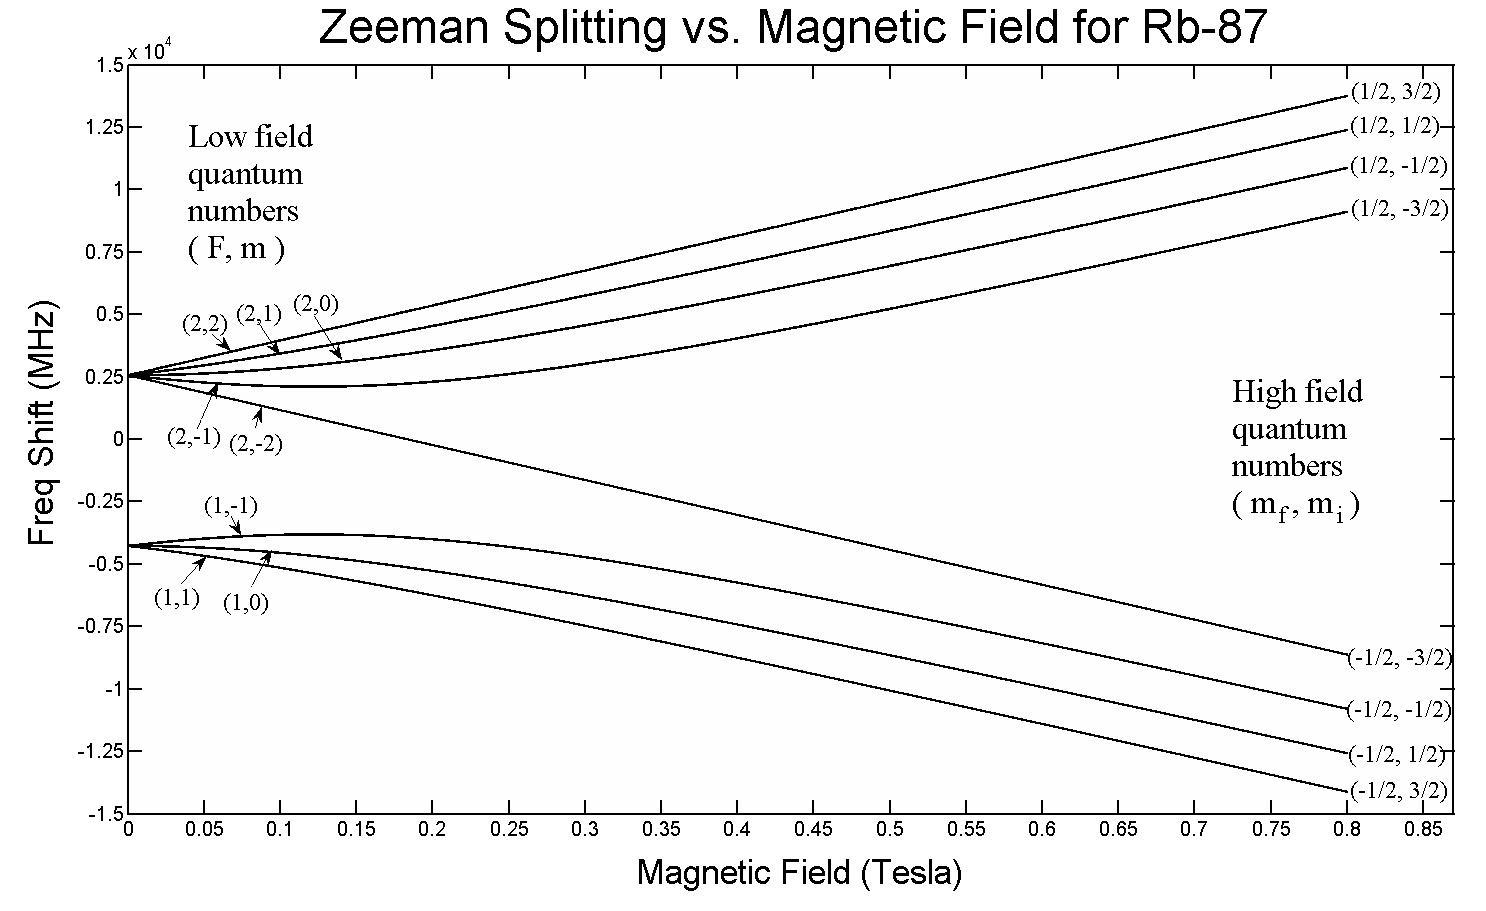 Module 3 Lesson 5 Fig.6(1) Zeeman Splitting against Magnetic Field